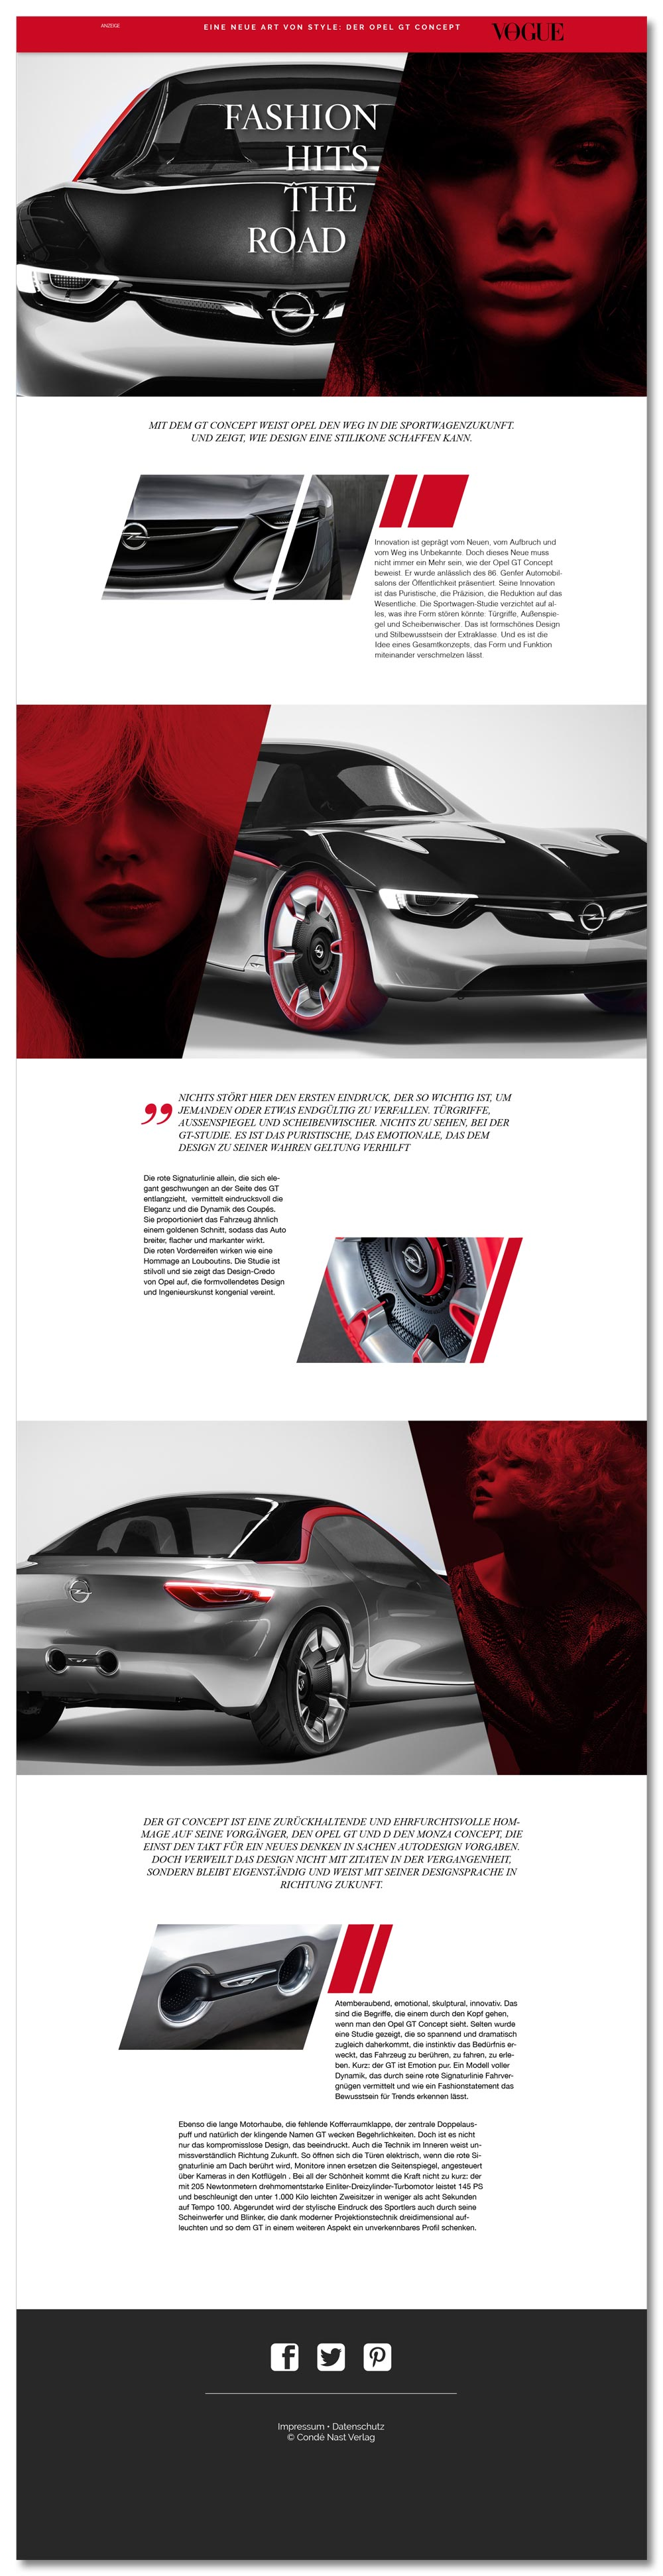 Opel-VG-2016-02_1000.jpg